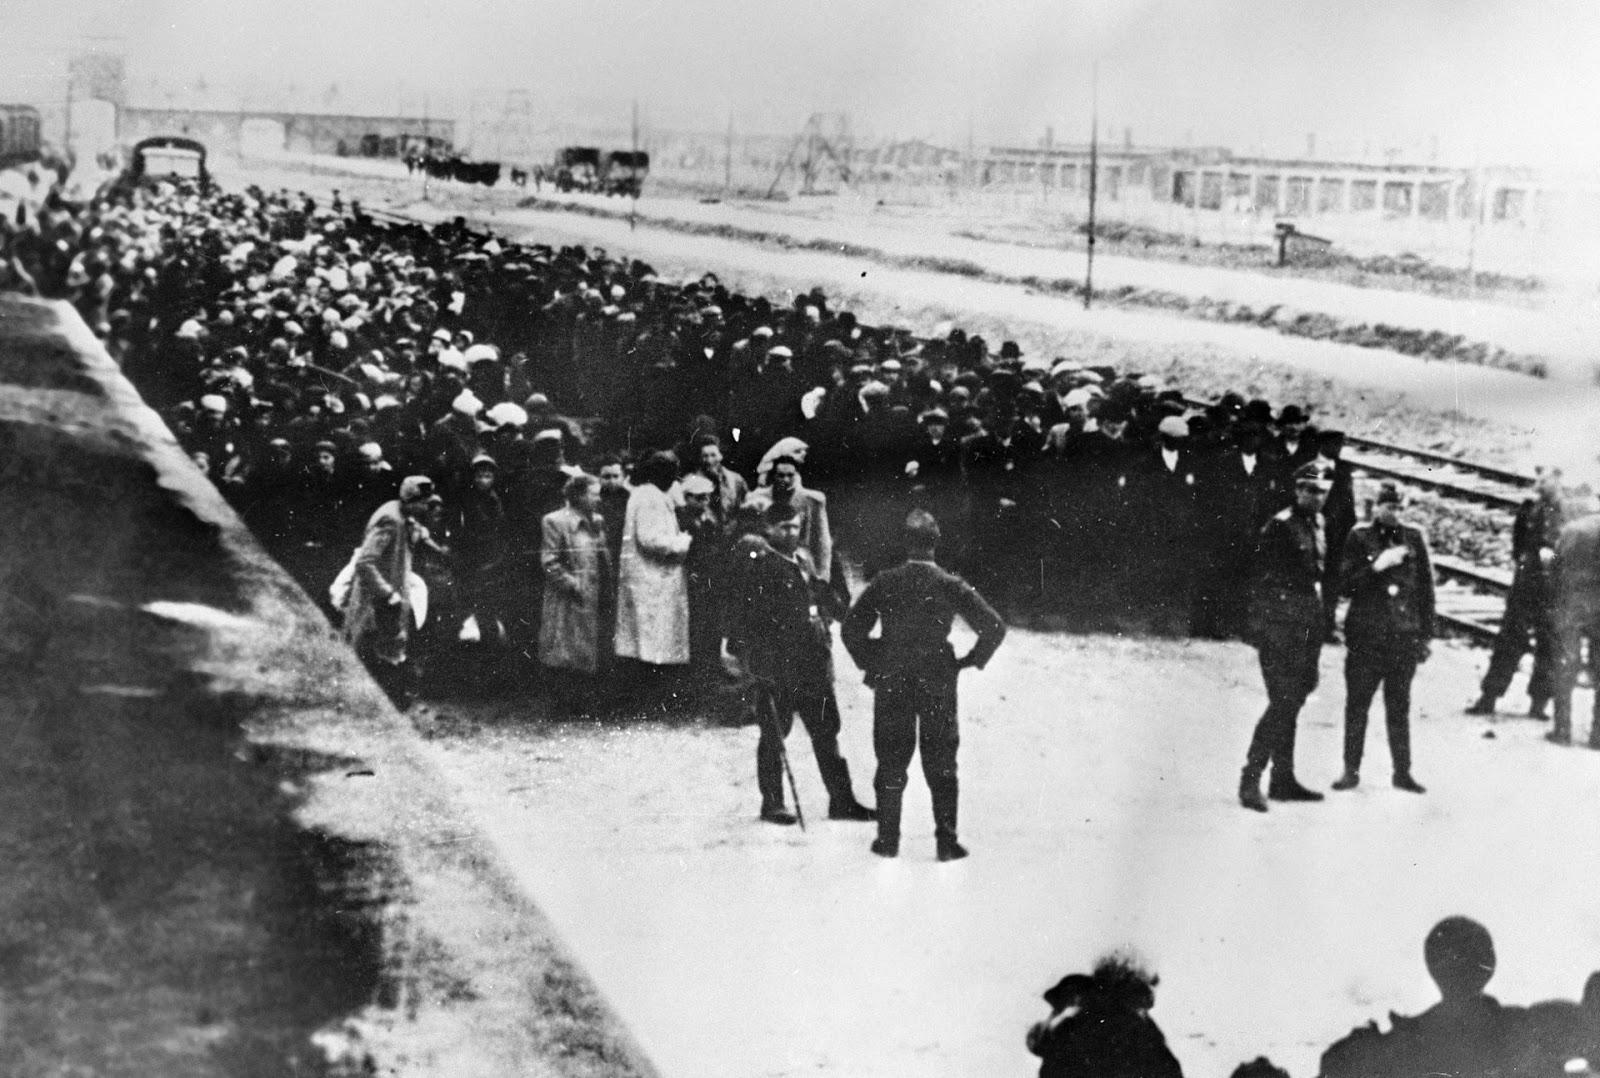 Herida abierta de la historia  ¿Quién liberó la 'fábrica de la muerte' de Auschwitz? 54c650e672139e740d8b456e